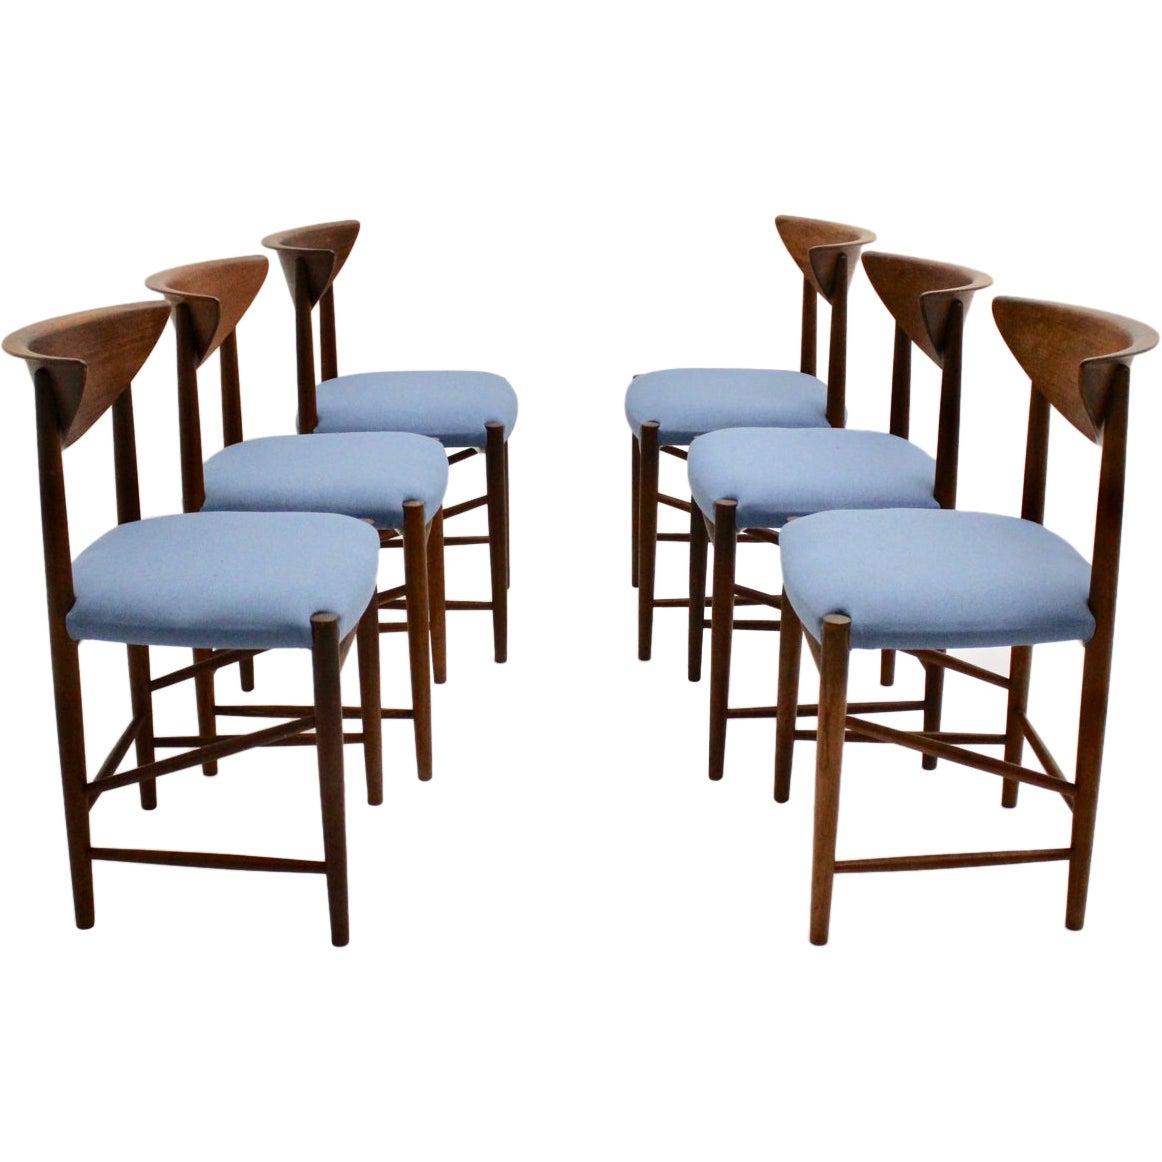 Scandinavian Modern Six Vintage Teak Dining Chairs Peter Hvidt, Denmark